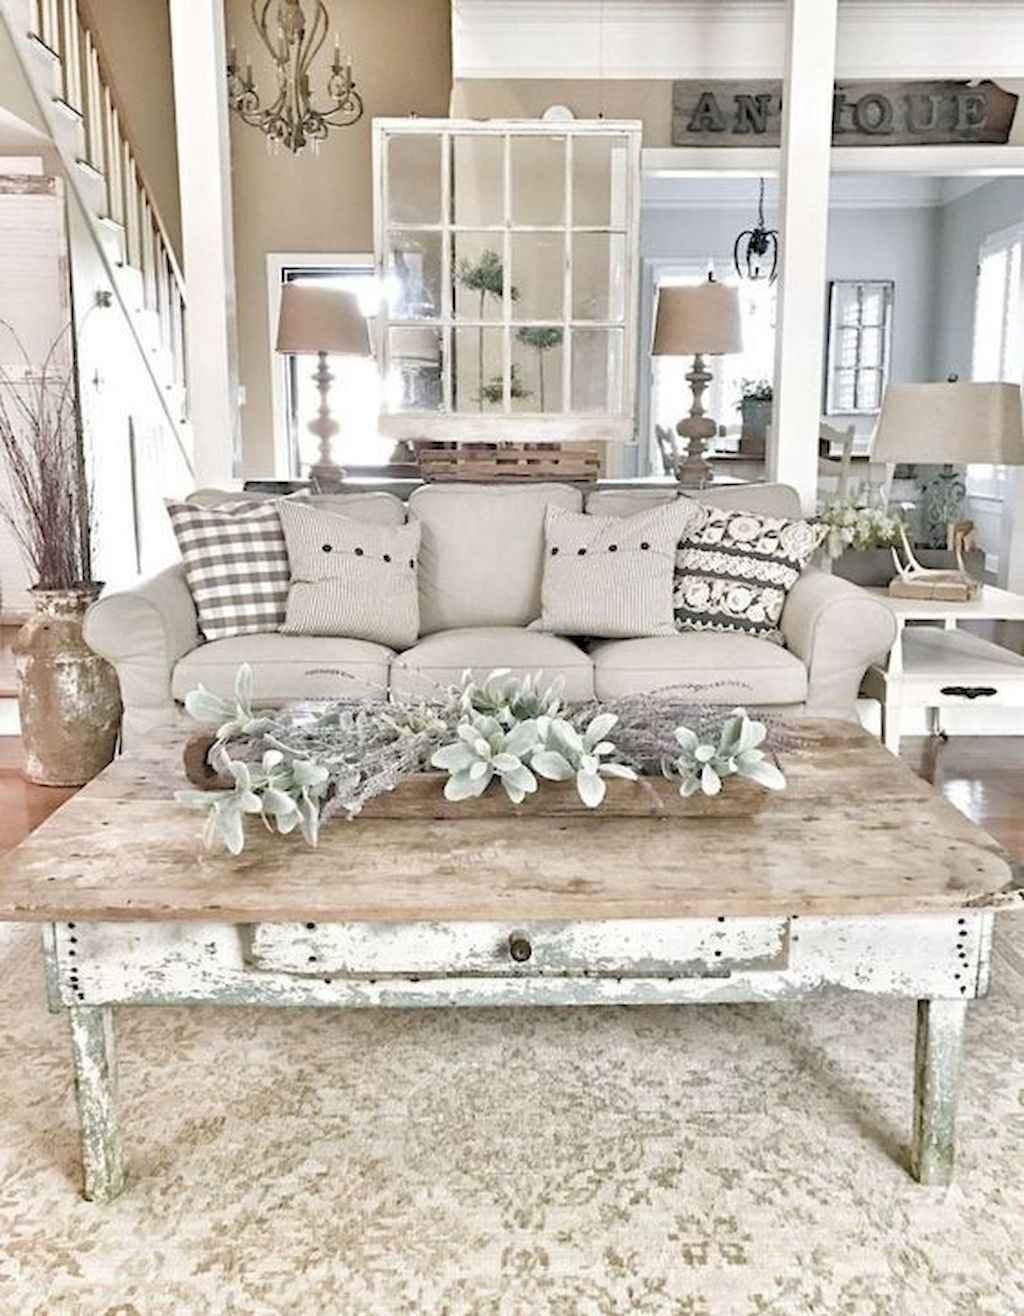 10 Romantic Shabby Chic Living Room Decor Ideas Domakeover Com Shabby Chic Decor Living Room Farmhouse Decor Living Room Apartment Living Room Design #shabby #chic #living #room #decor